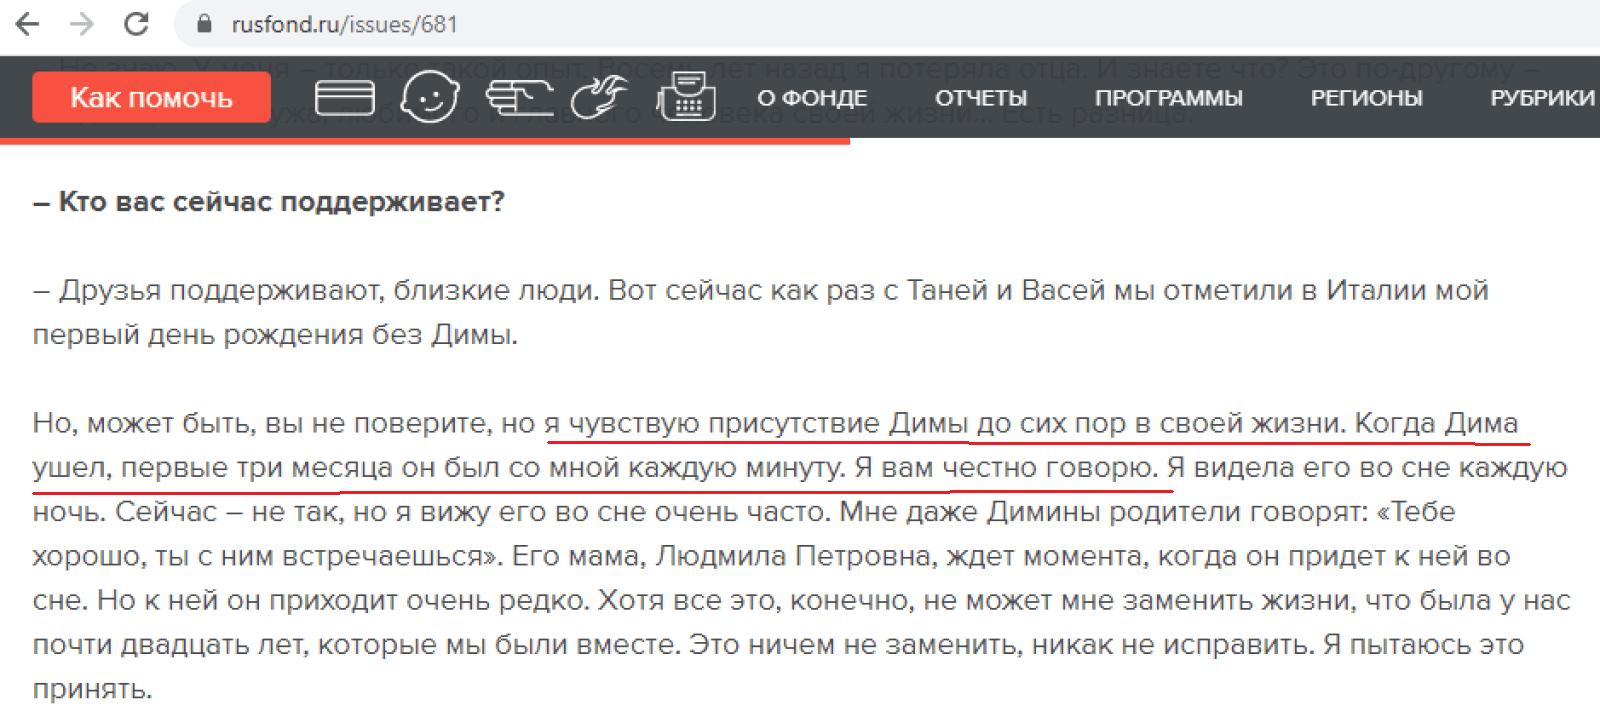 Хворостовский Дмитрий